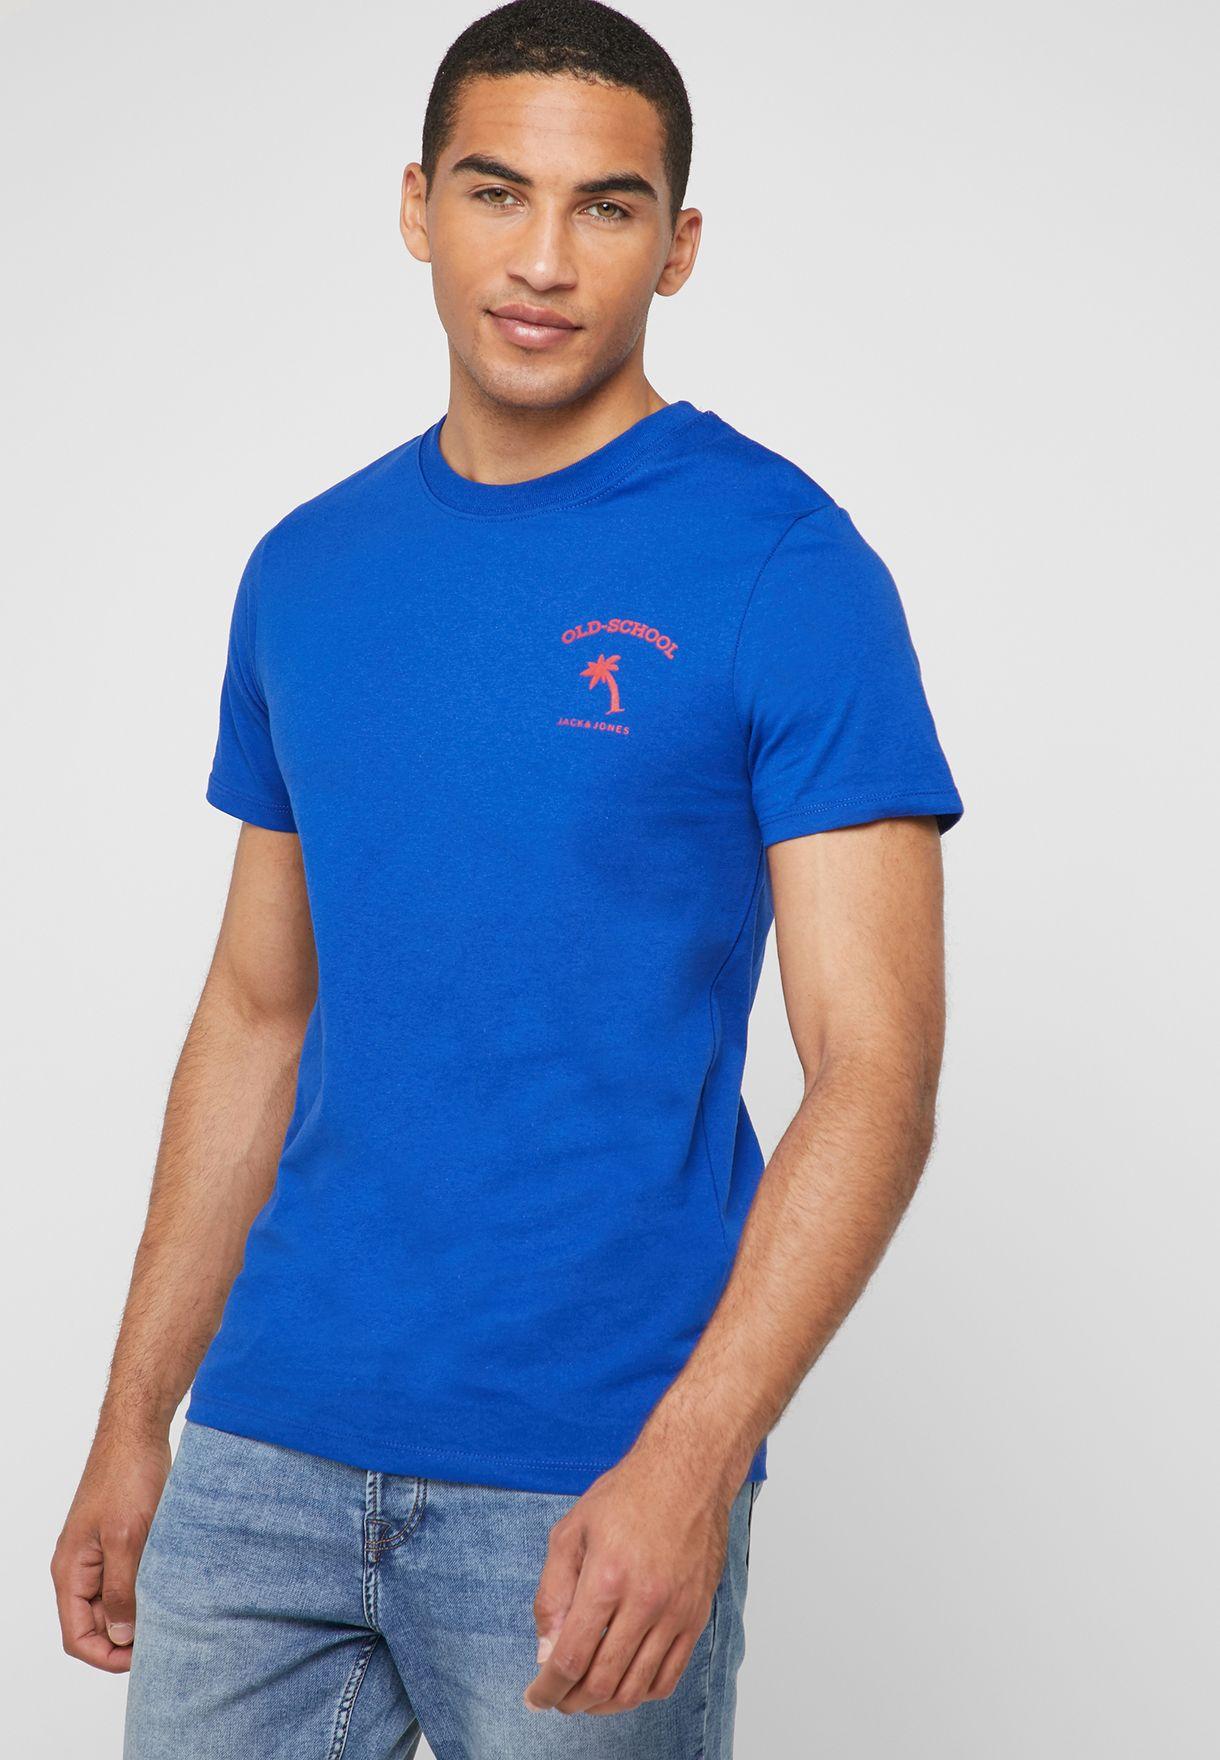 Malibuclub Crew Neck T-Shirt